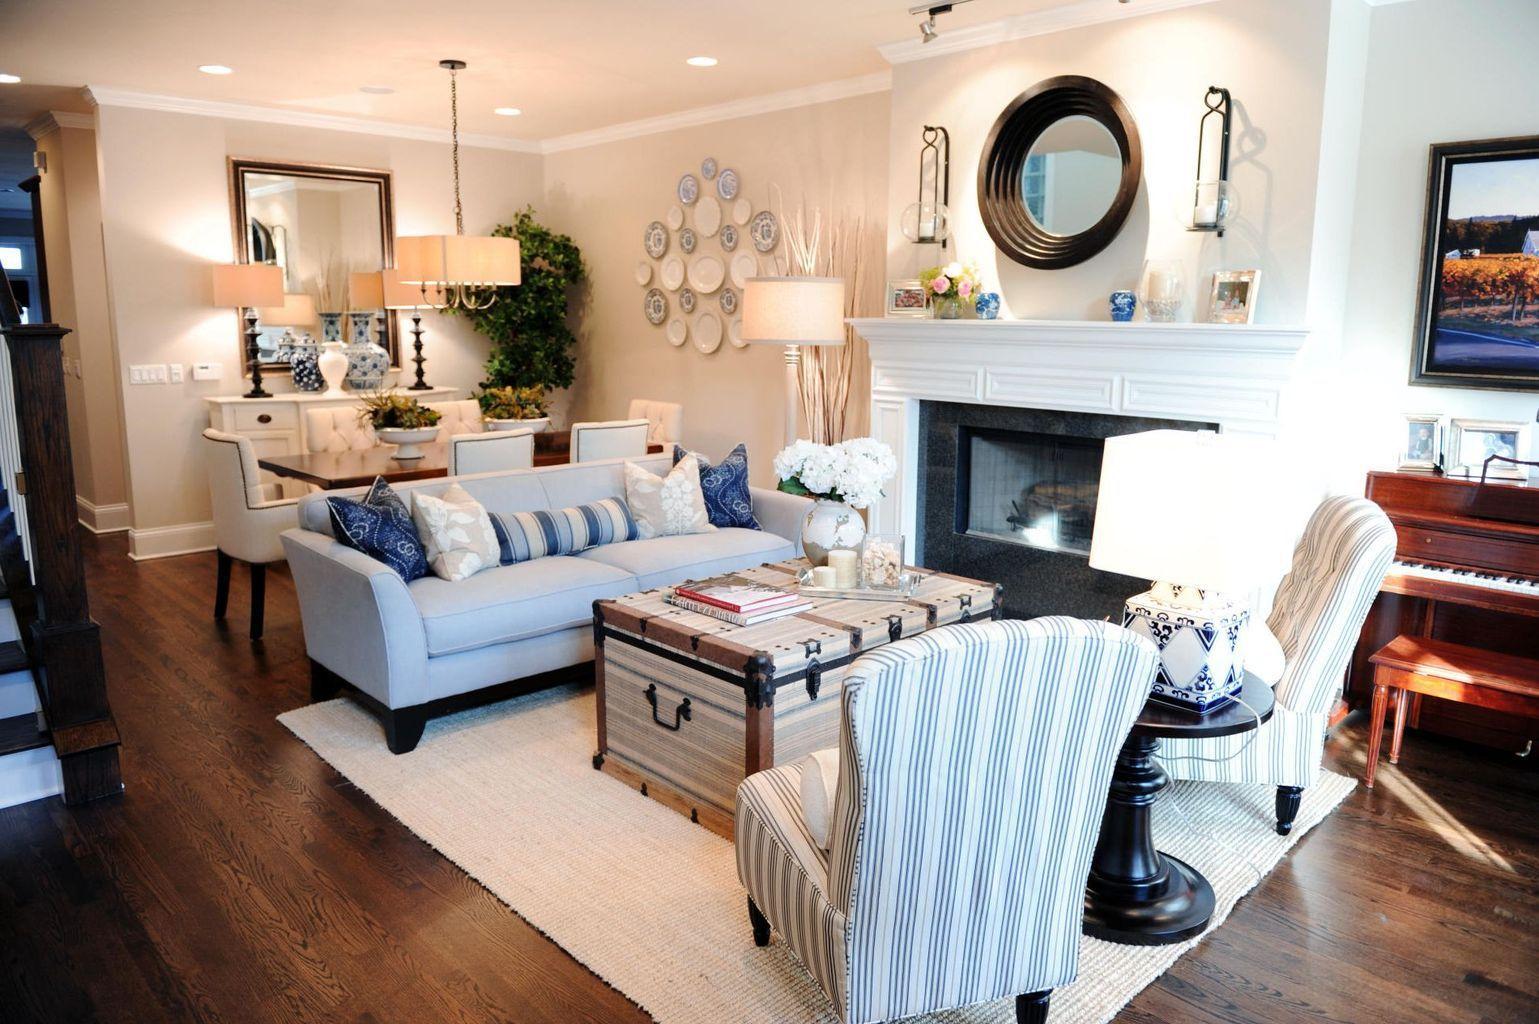 50 creative living room dining room combo ideas 56